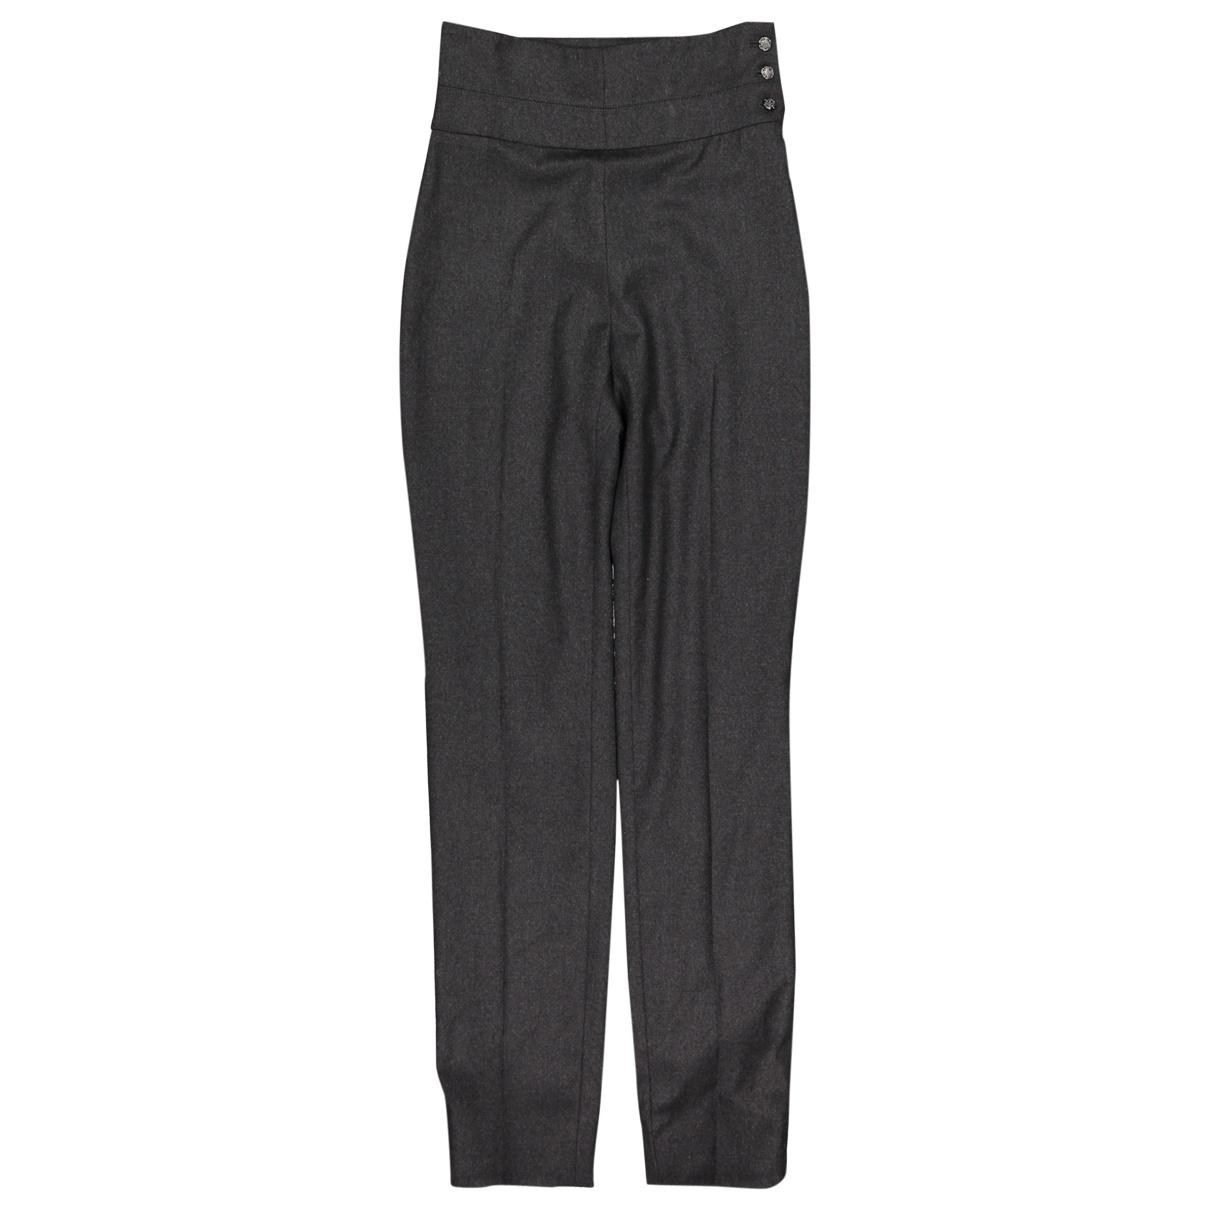 Pantalon recto de Lana Chanel